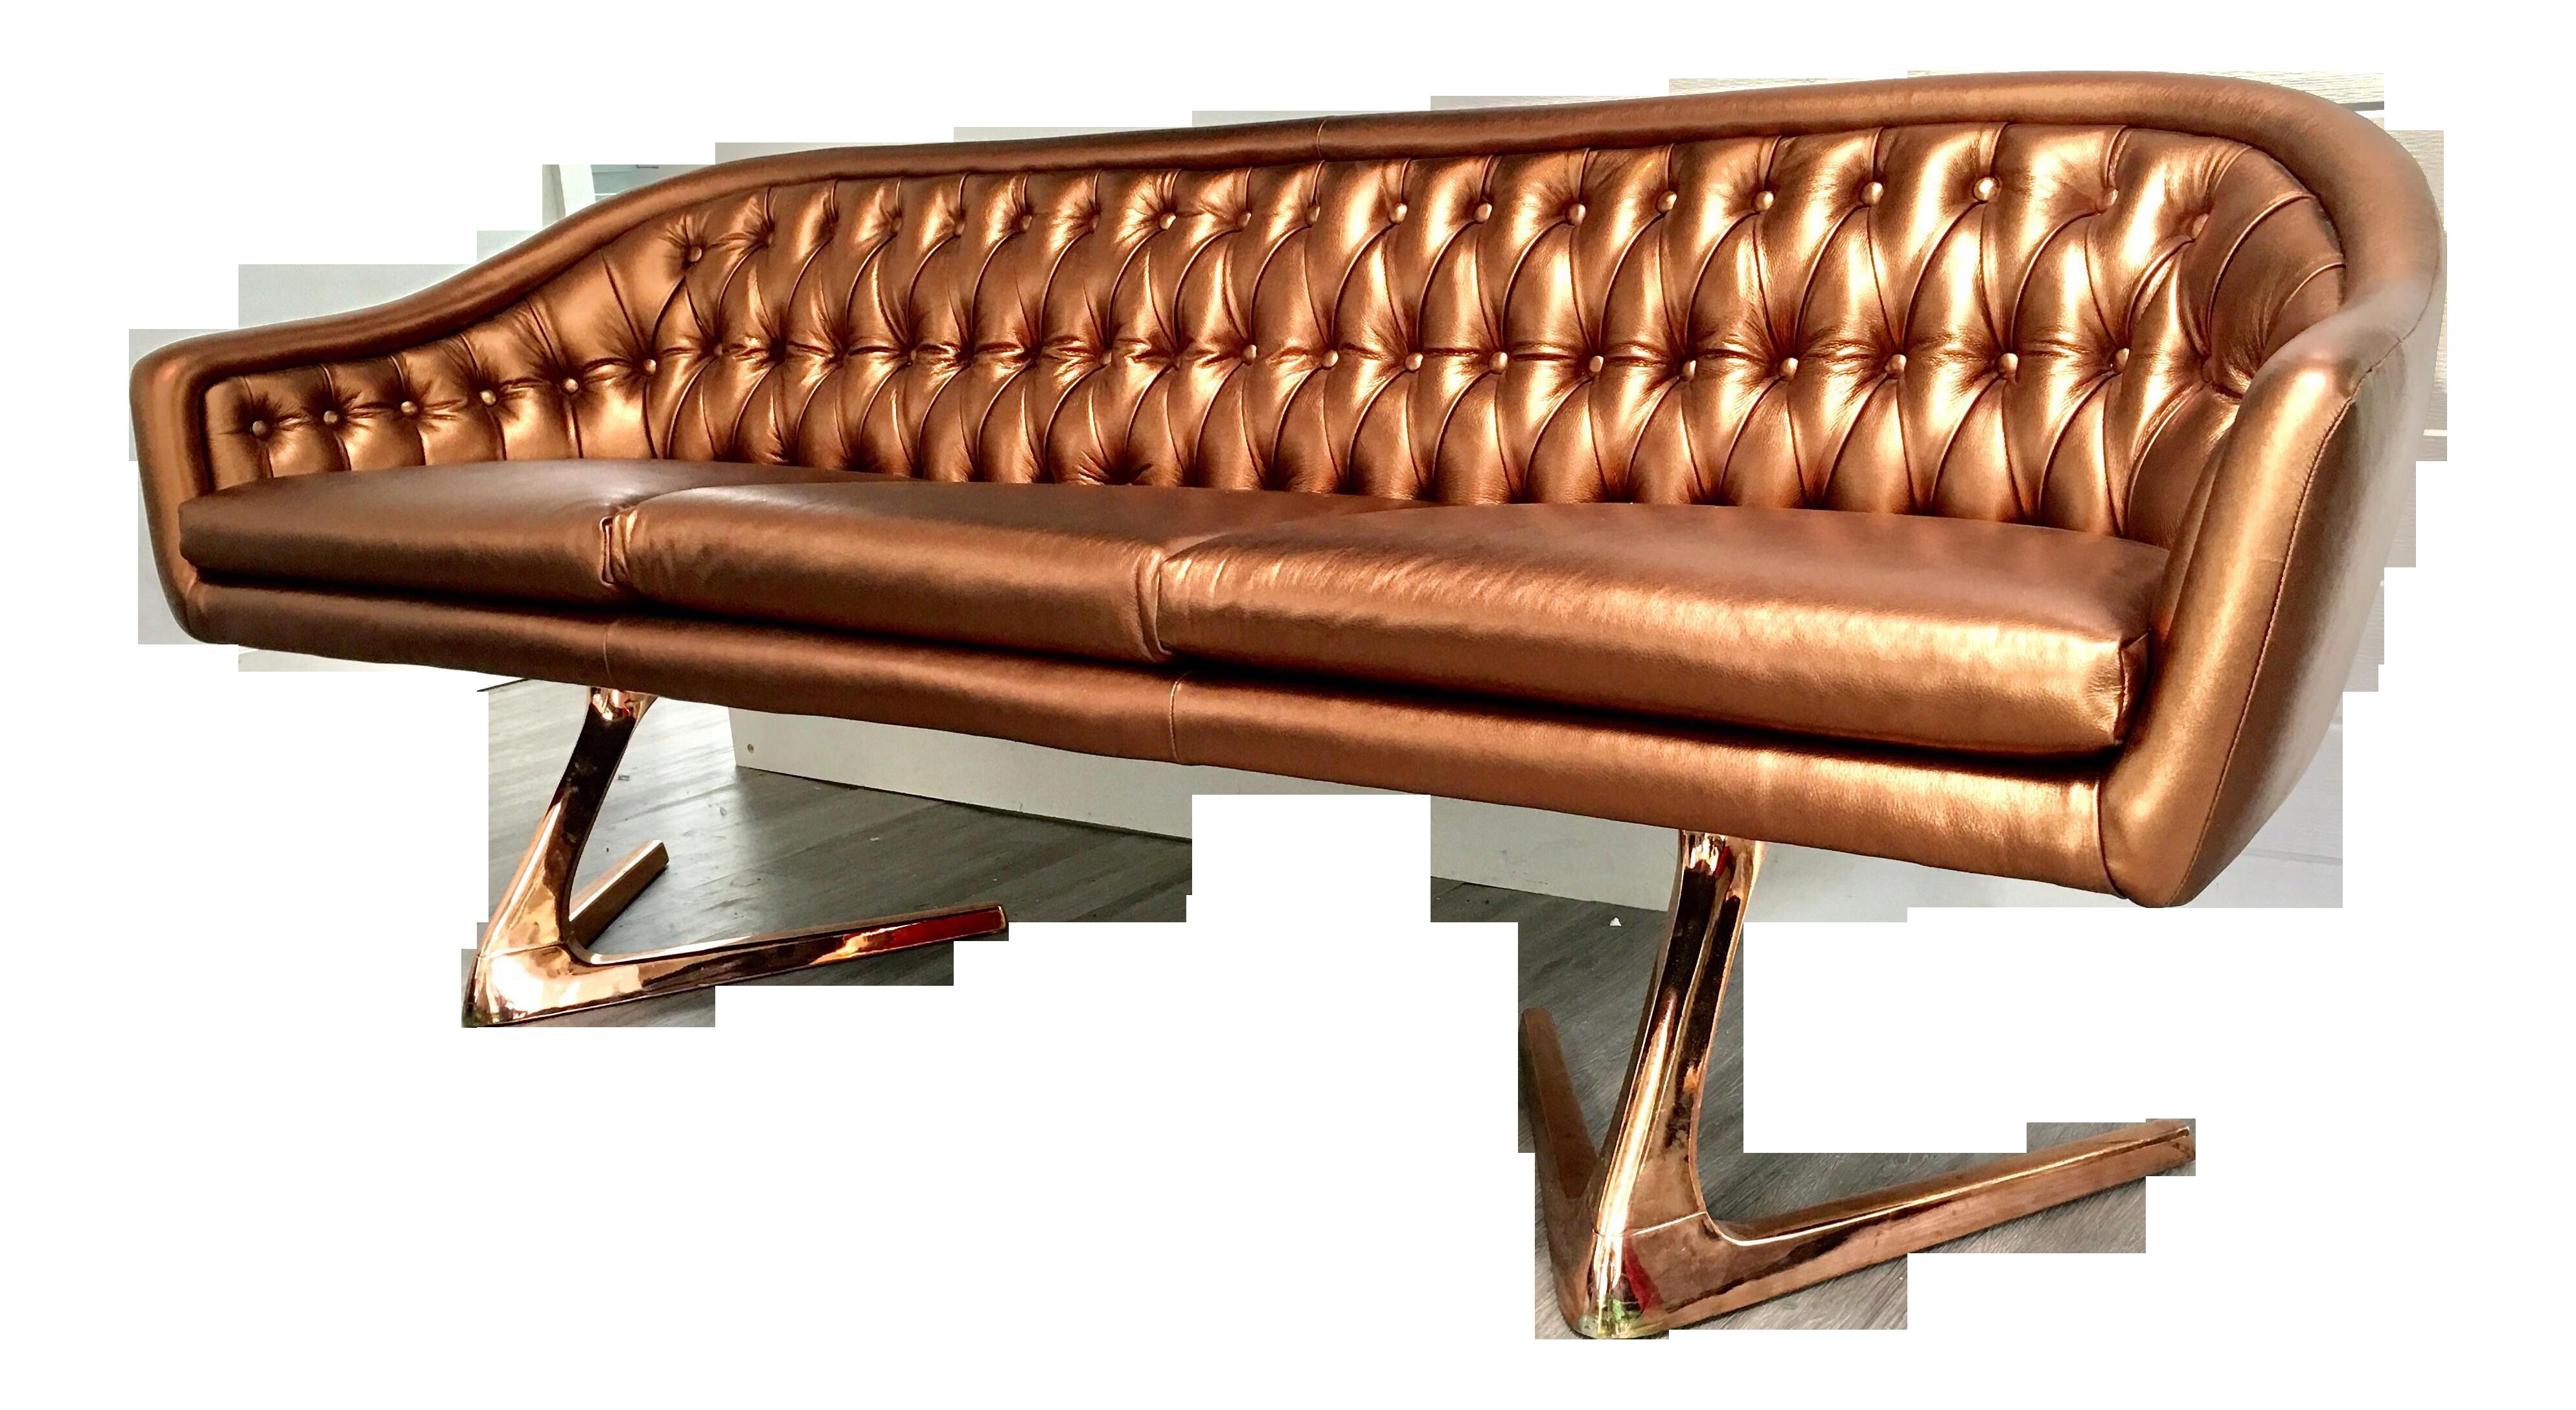 Copper Rose Gold Chromcraft Sculpta Sofa | Pinterest